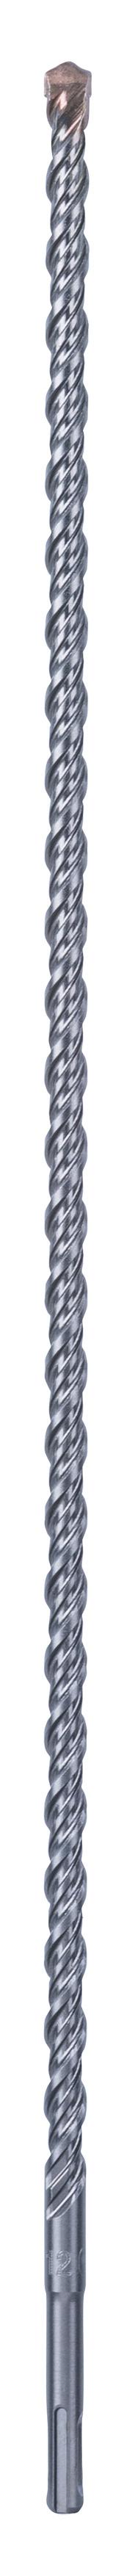 Image of   Hammerbor SDS-plus-5 12 x 550 x 615 mm